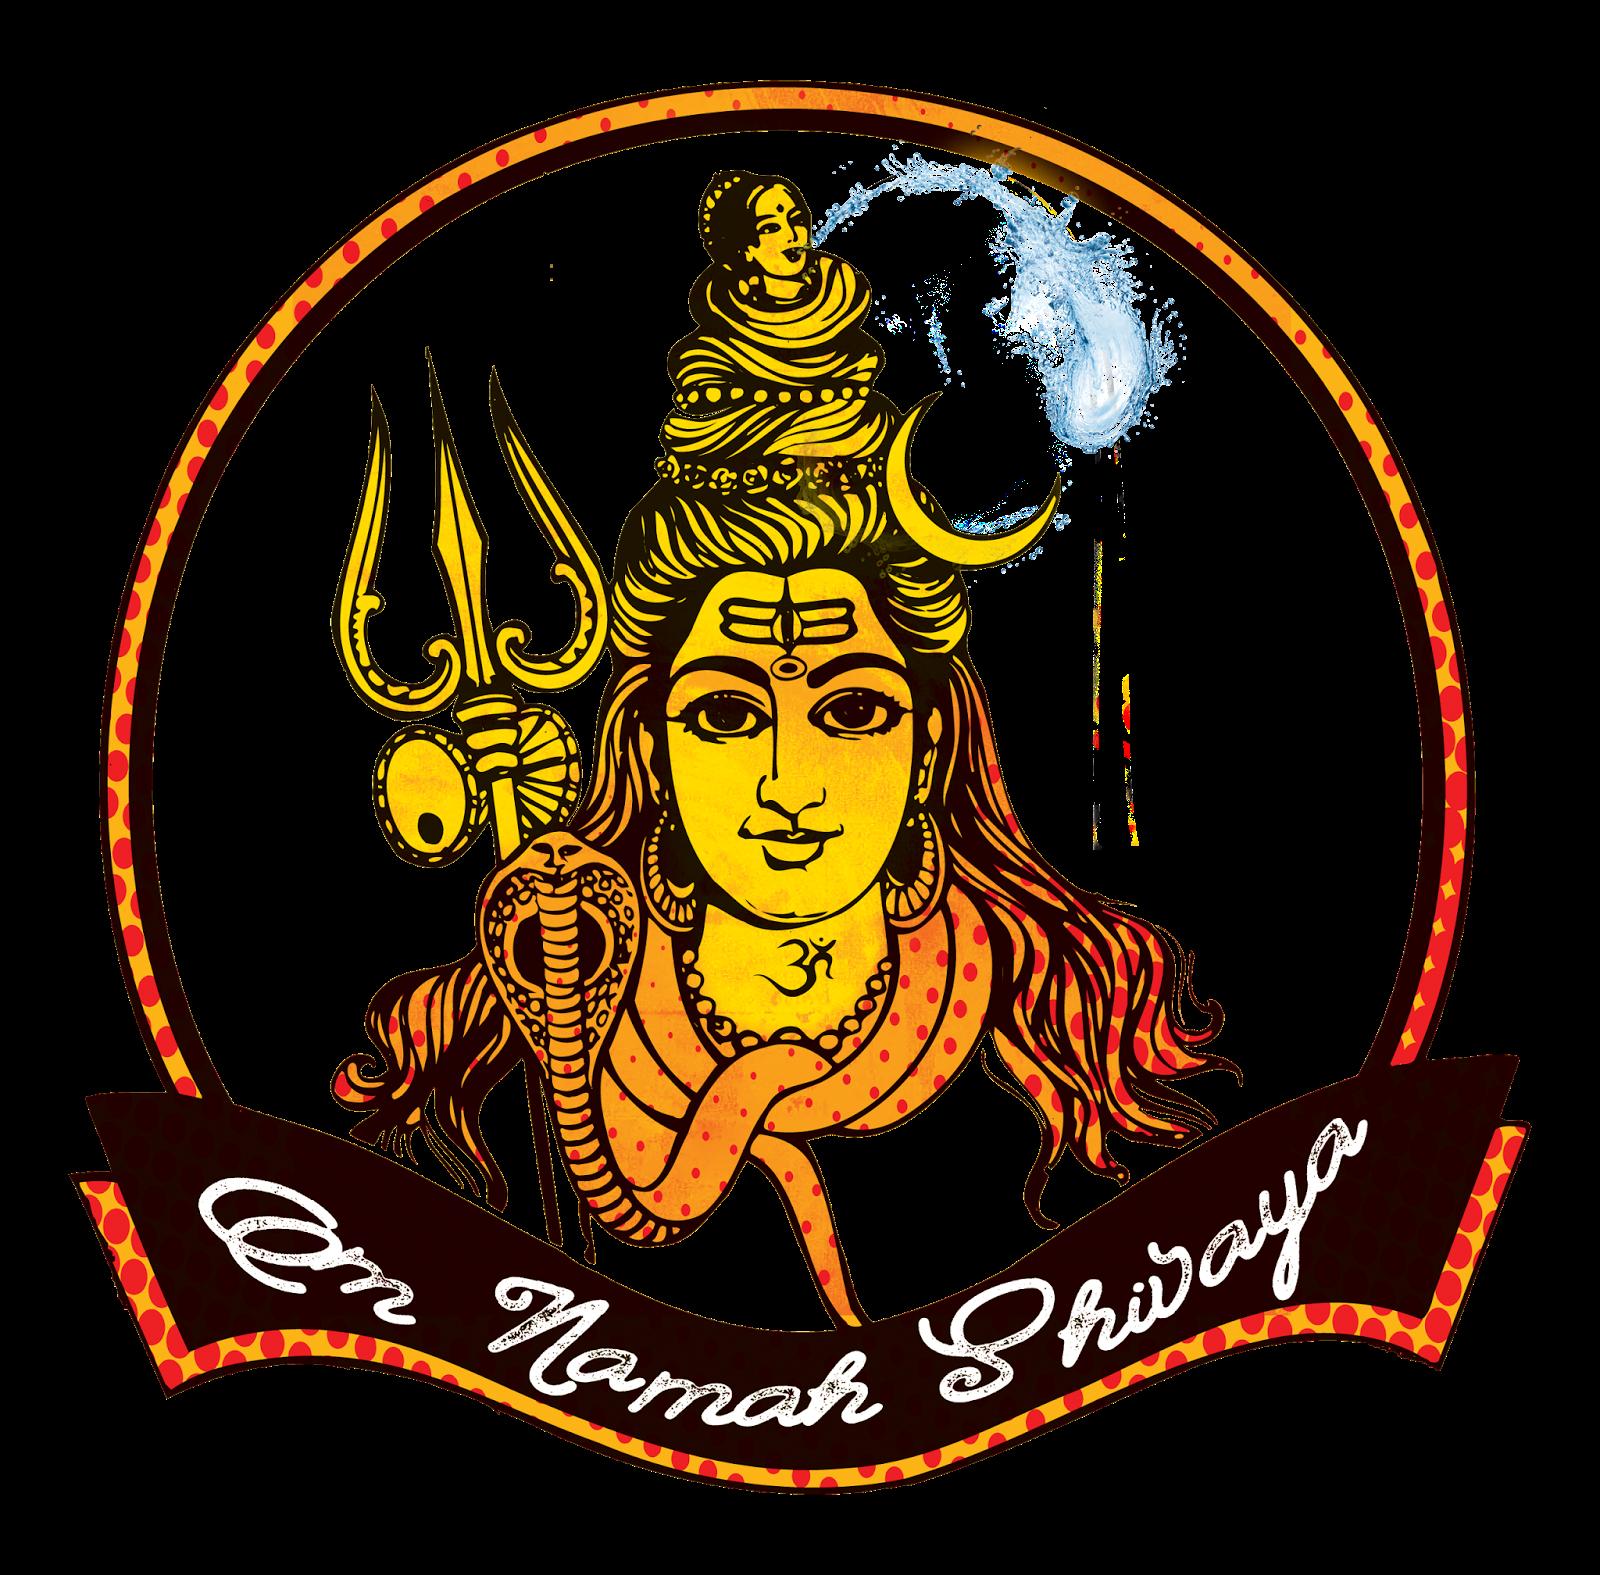 Lord shiva Png Clipart image transparent, Lord Ganga devi Transparent image  png